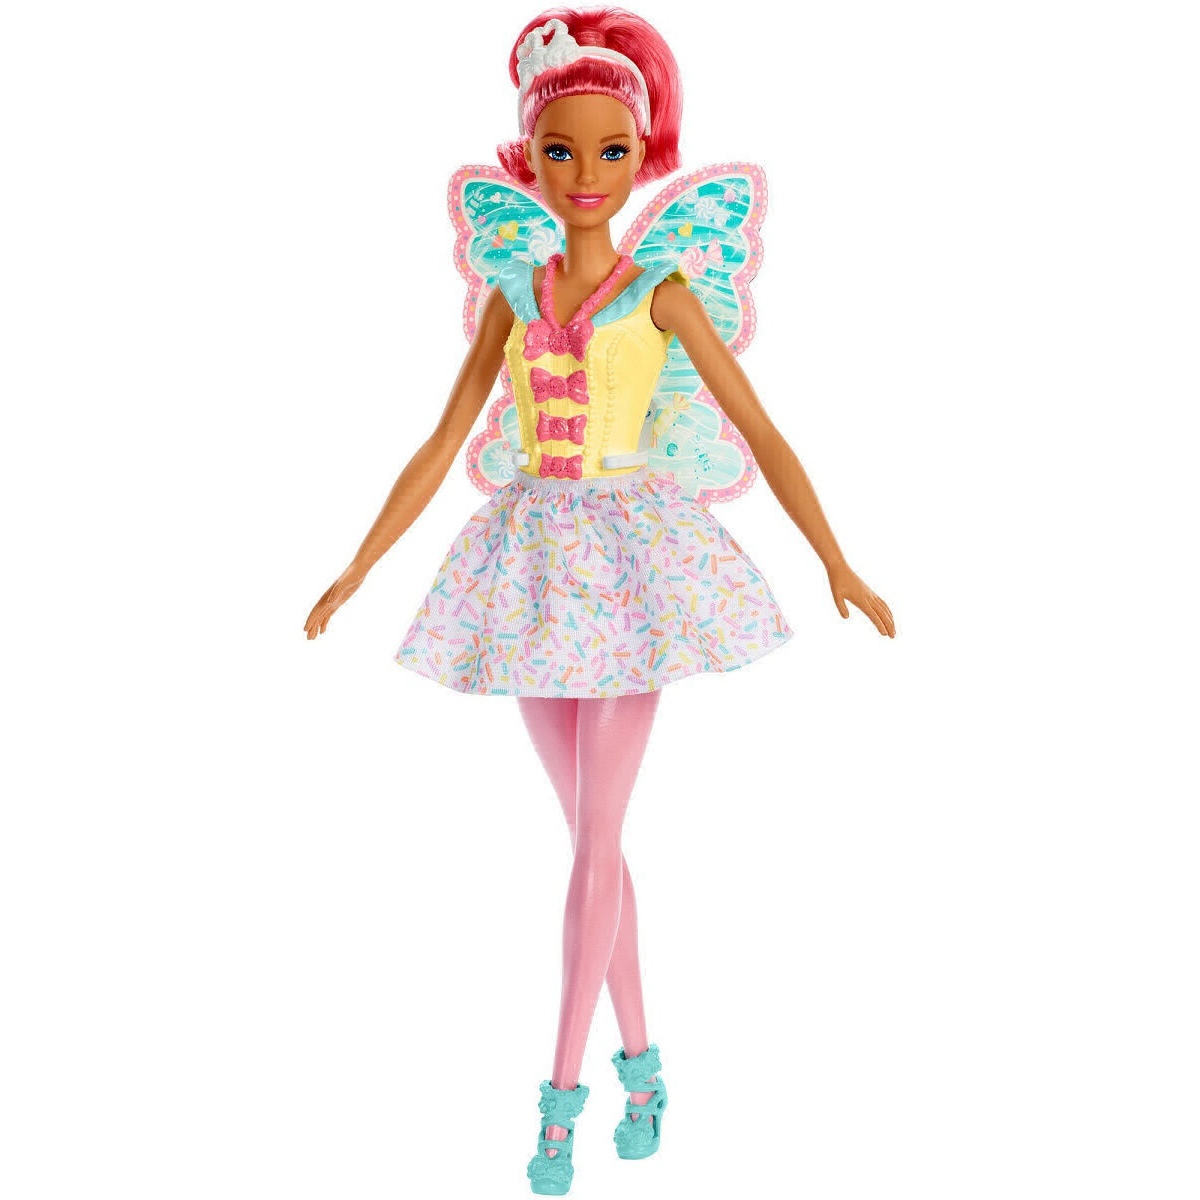 Кукла Mattel Фея Barbie в ассортименте barbie кукла медсестра dvf57